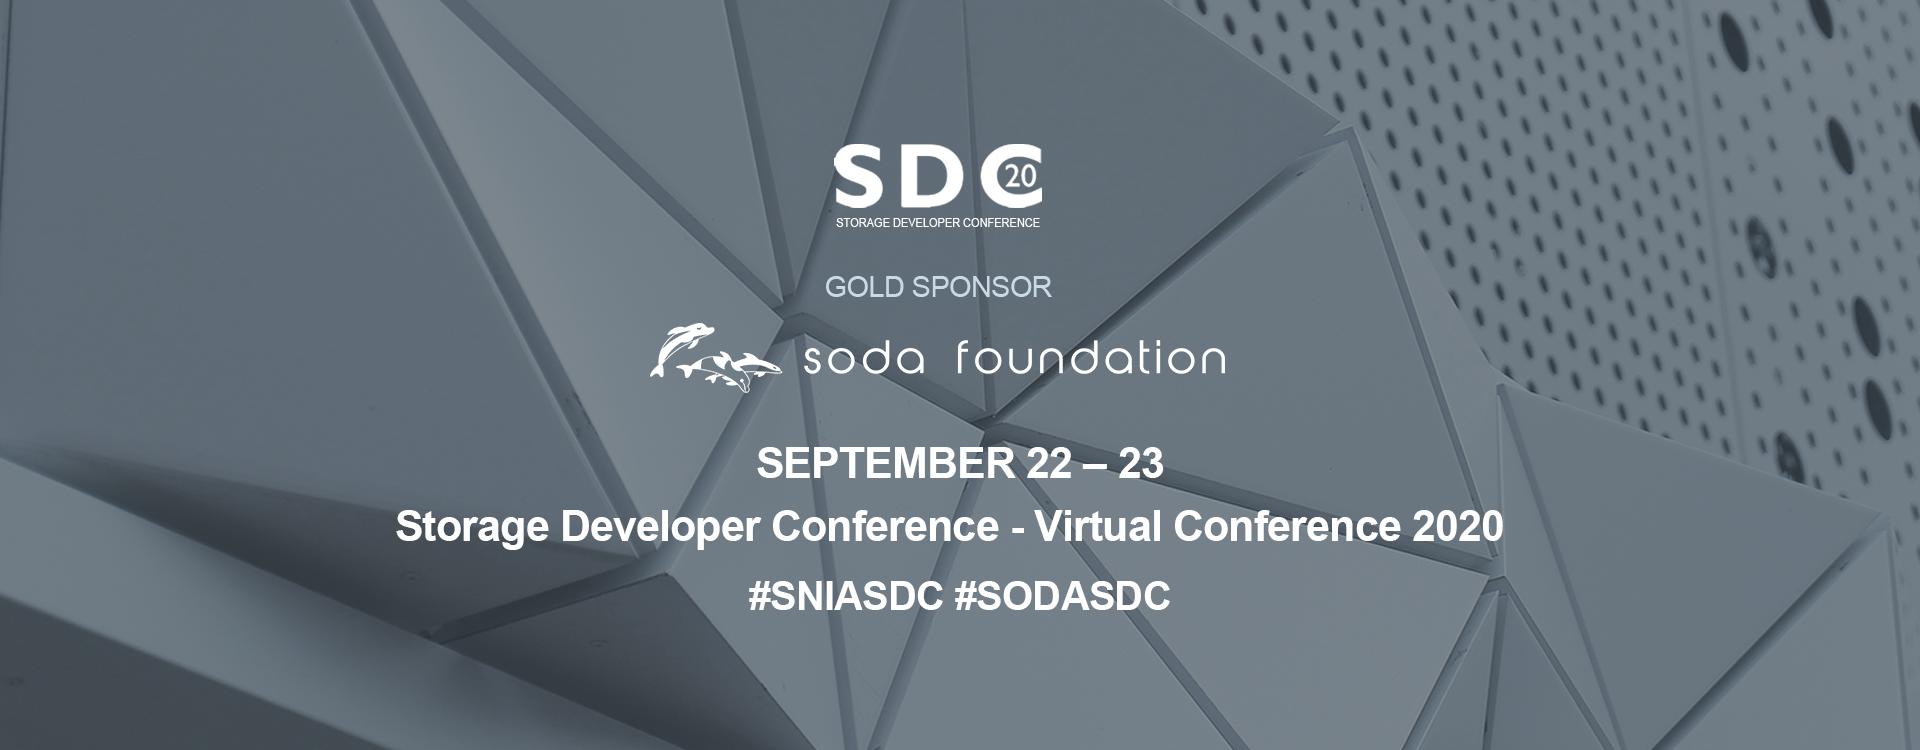 Storage Developer Conference Virtual Conference 2020